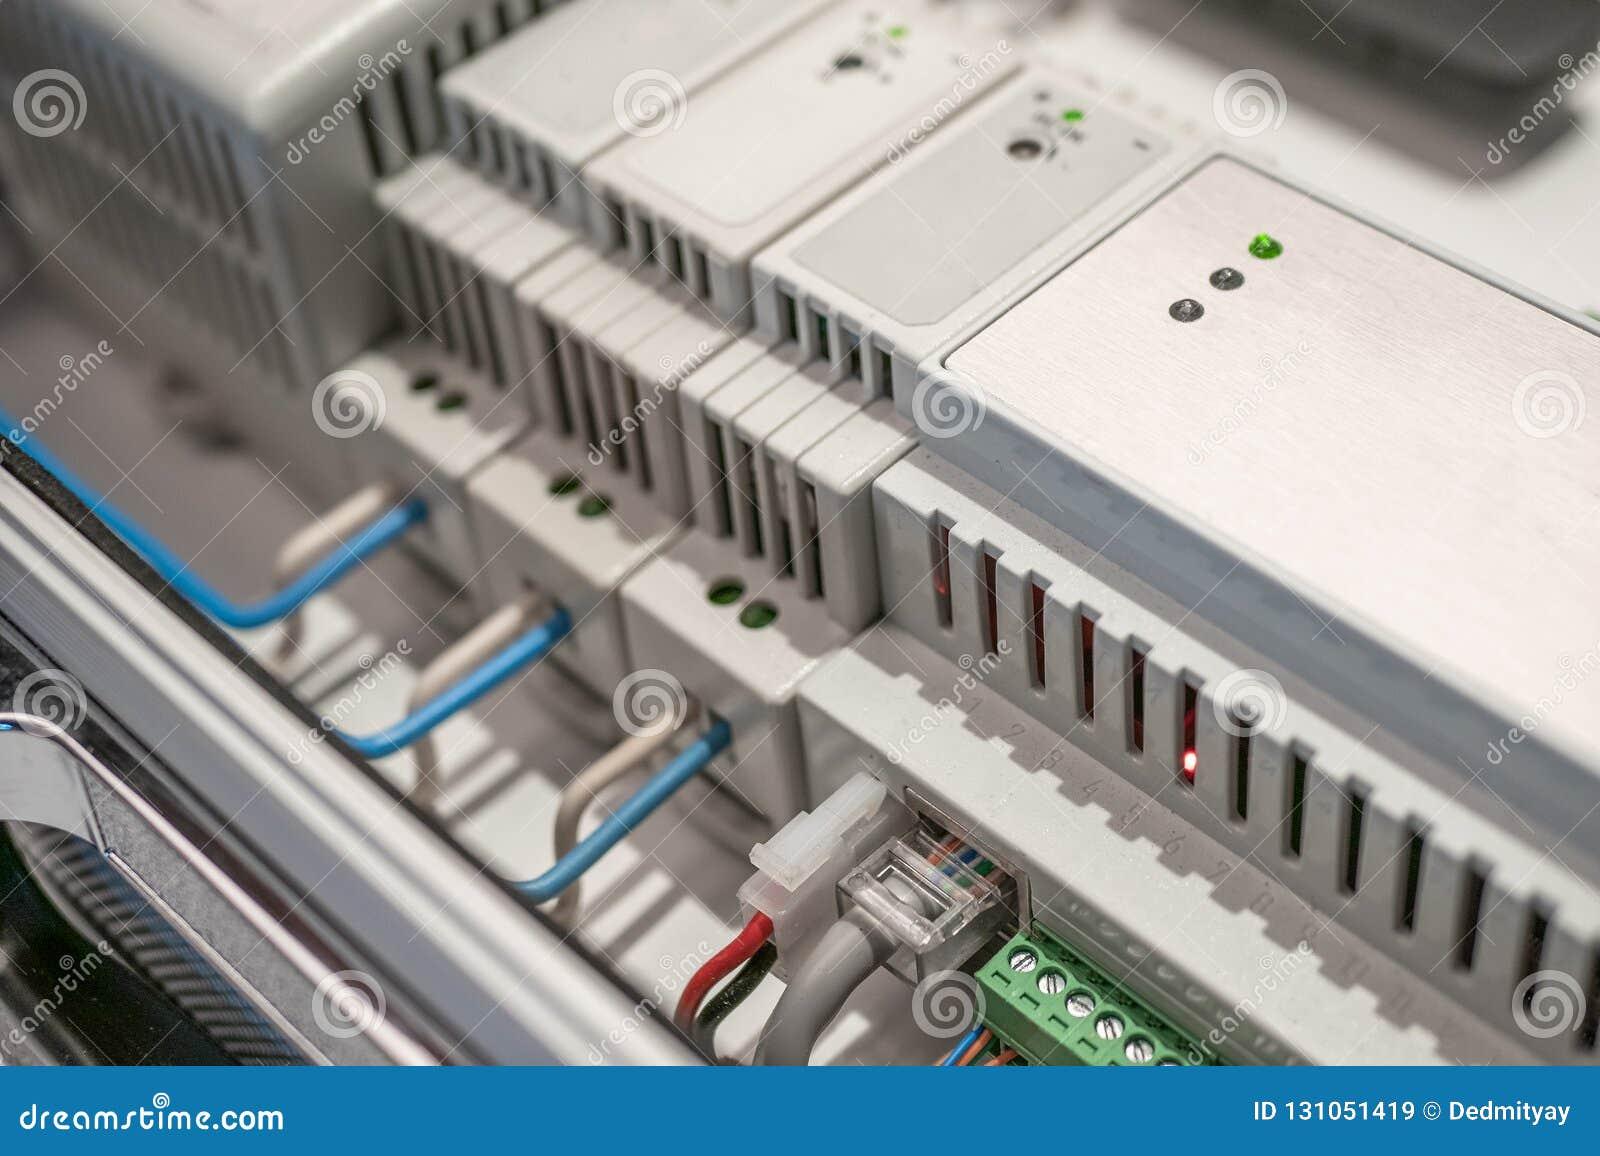 Netzschalter und Ethernet LAN-Kabel angeschlossen an intelligente Hausausrüstung, modernes Technologiekonzept